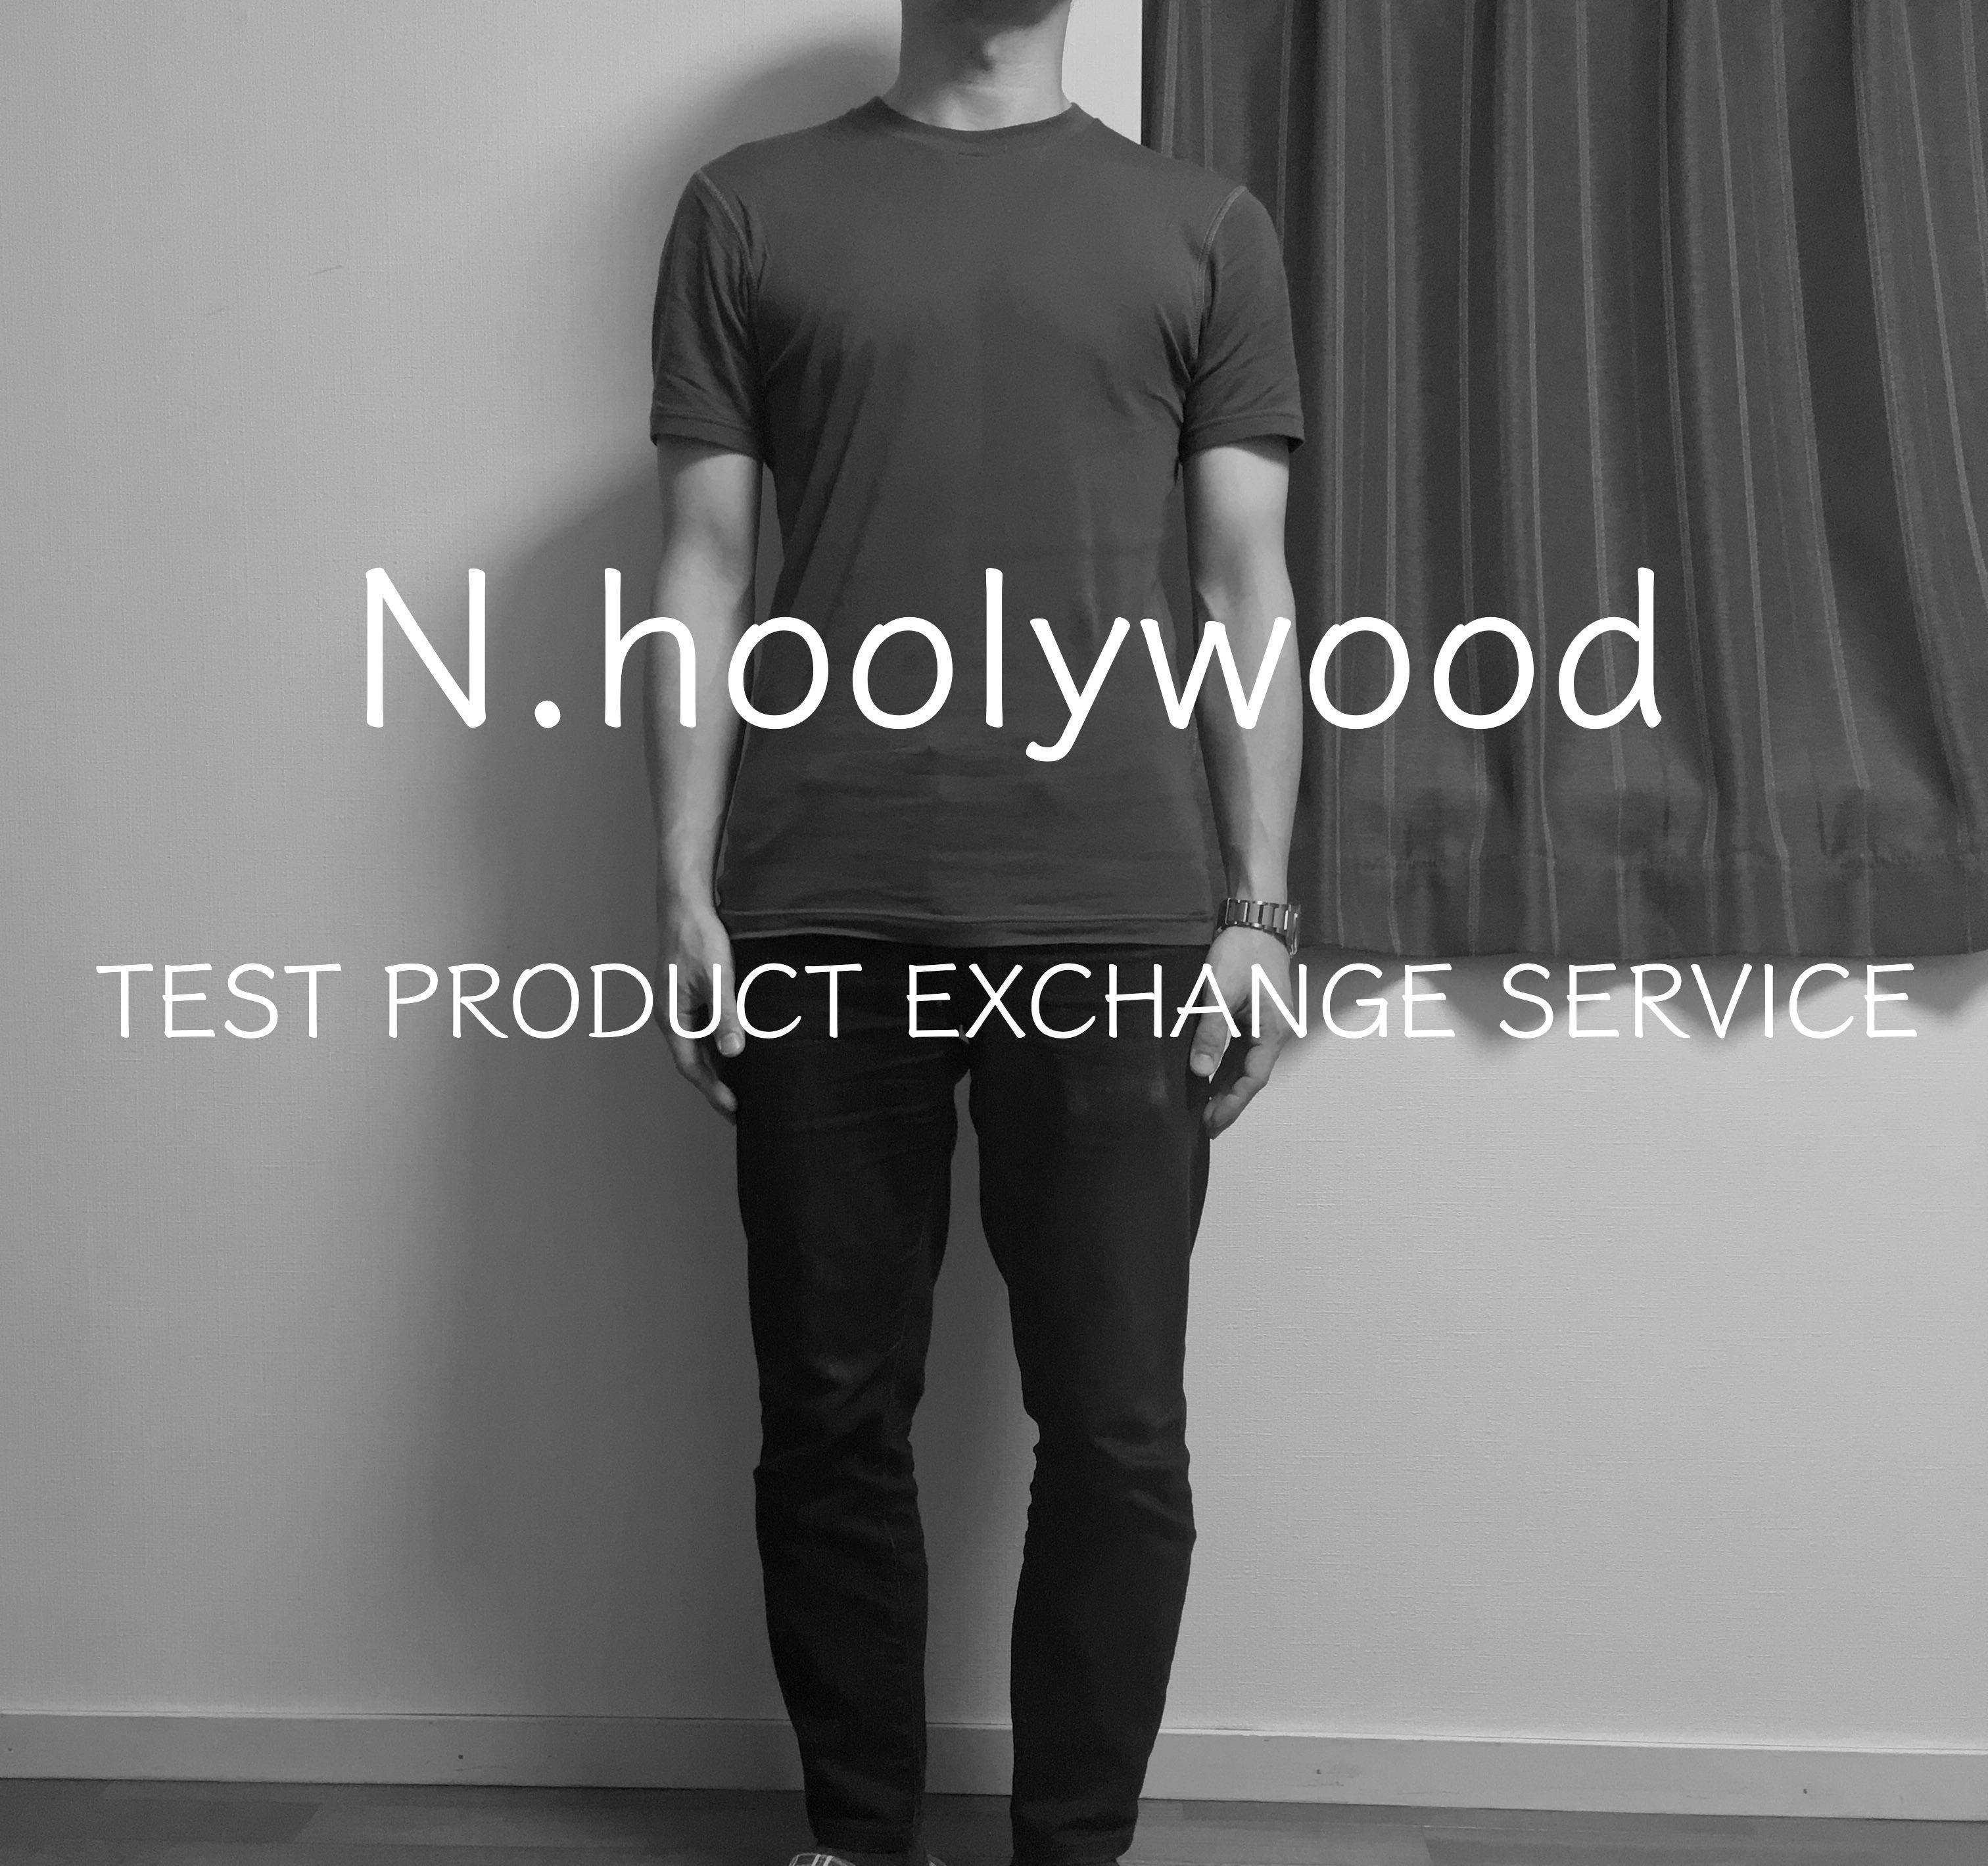 testproduct1